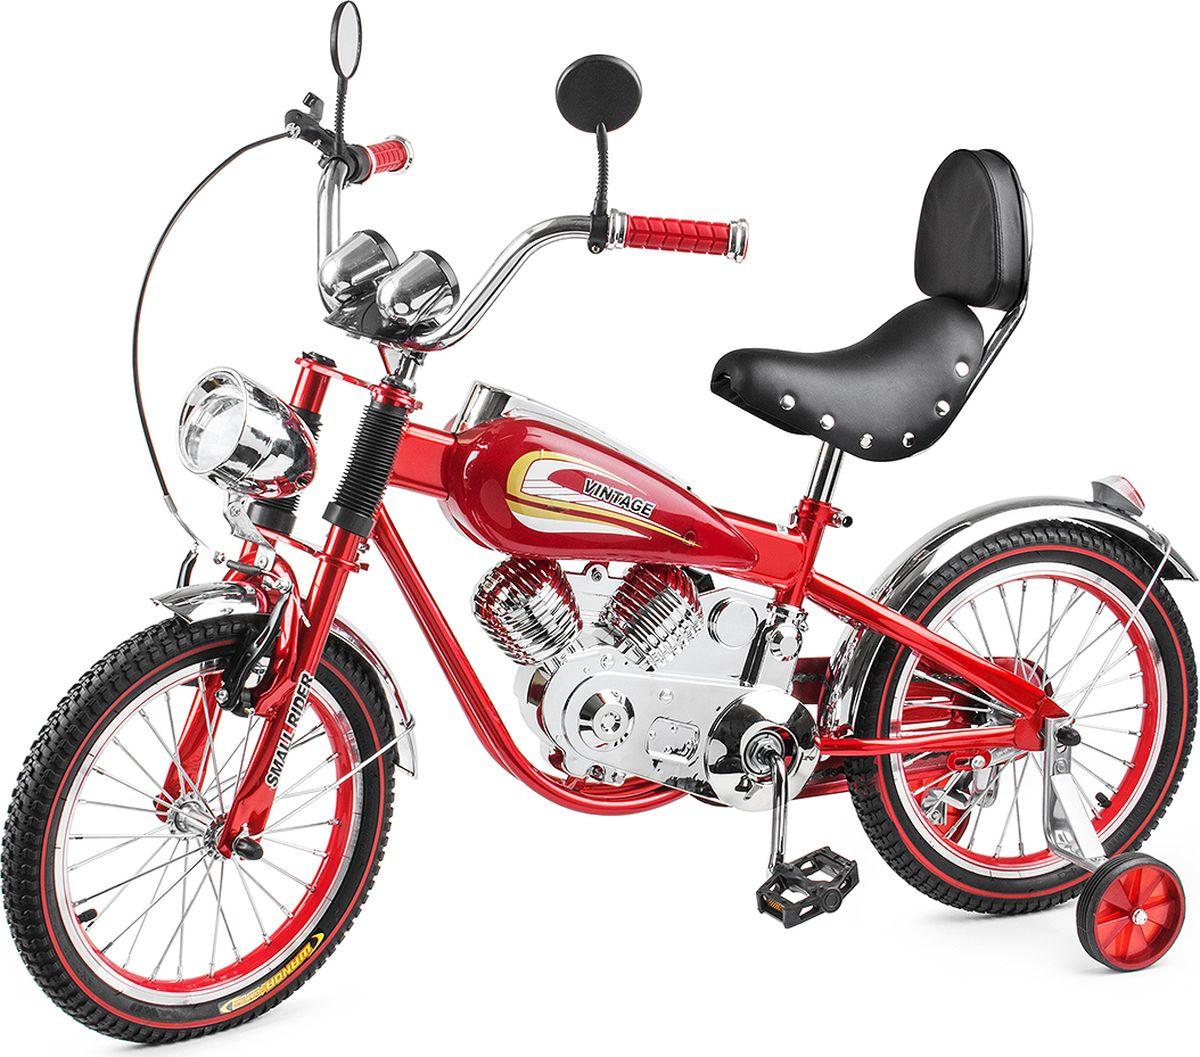 Small Rider Велосипед-мотоцикл детский Motobike Vintage цвет красный